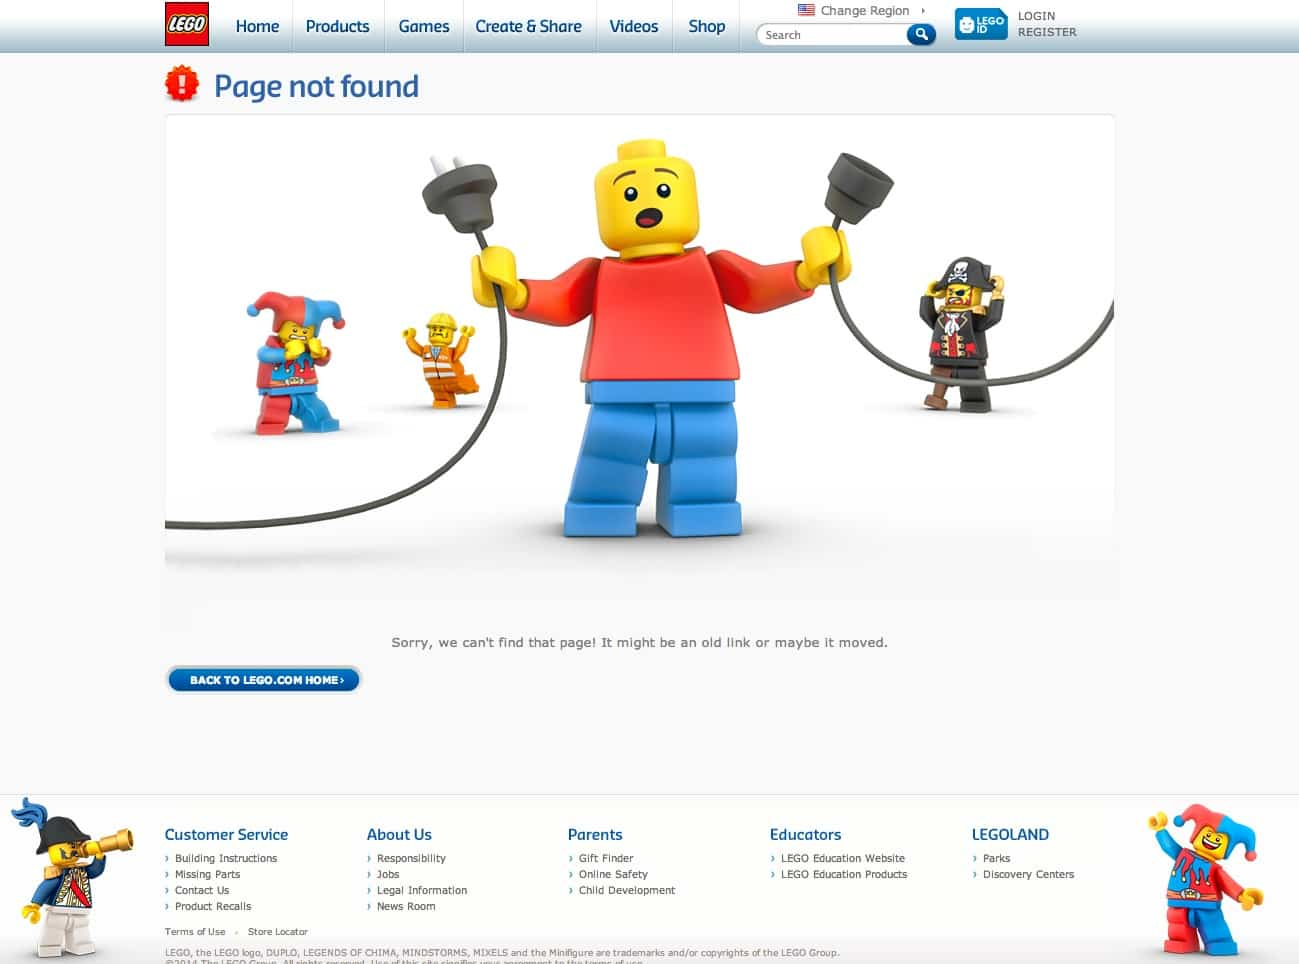 Lego man unplugs the power